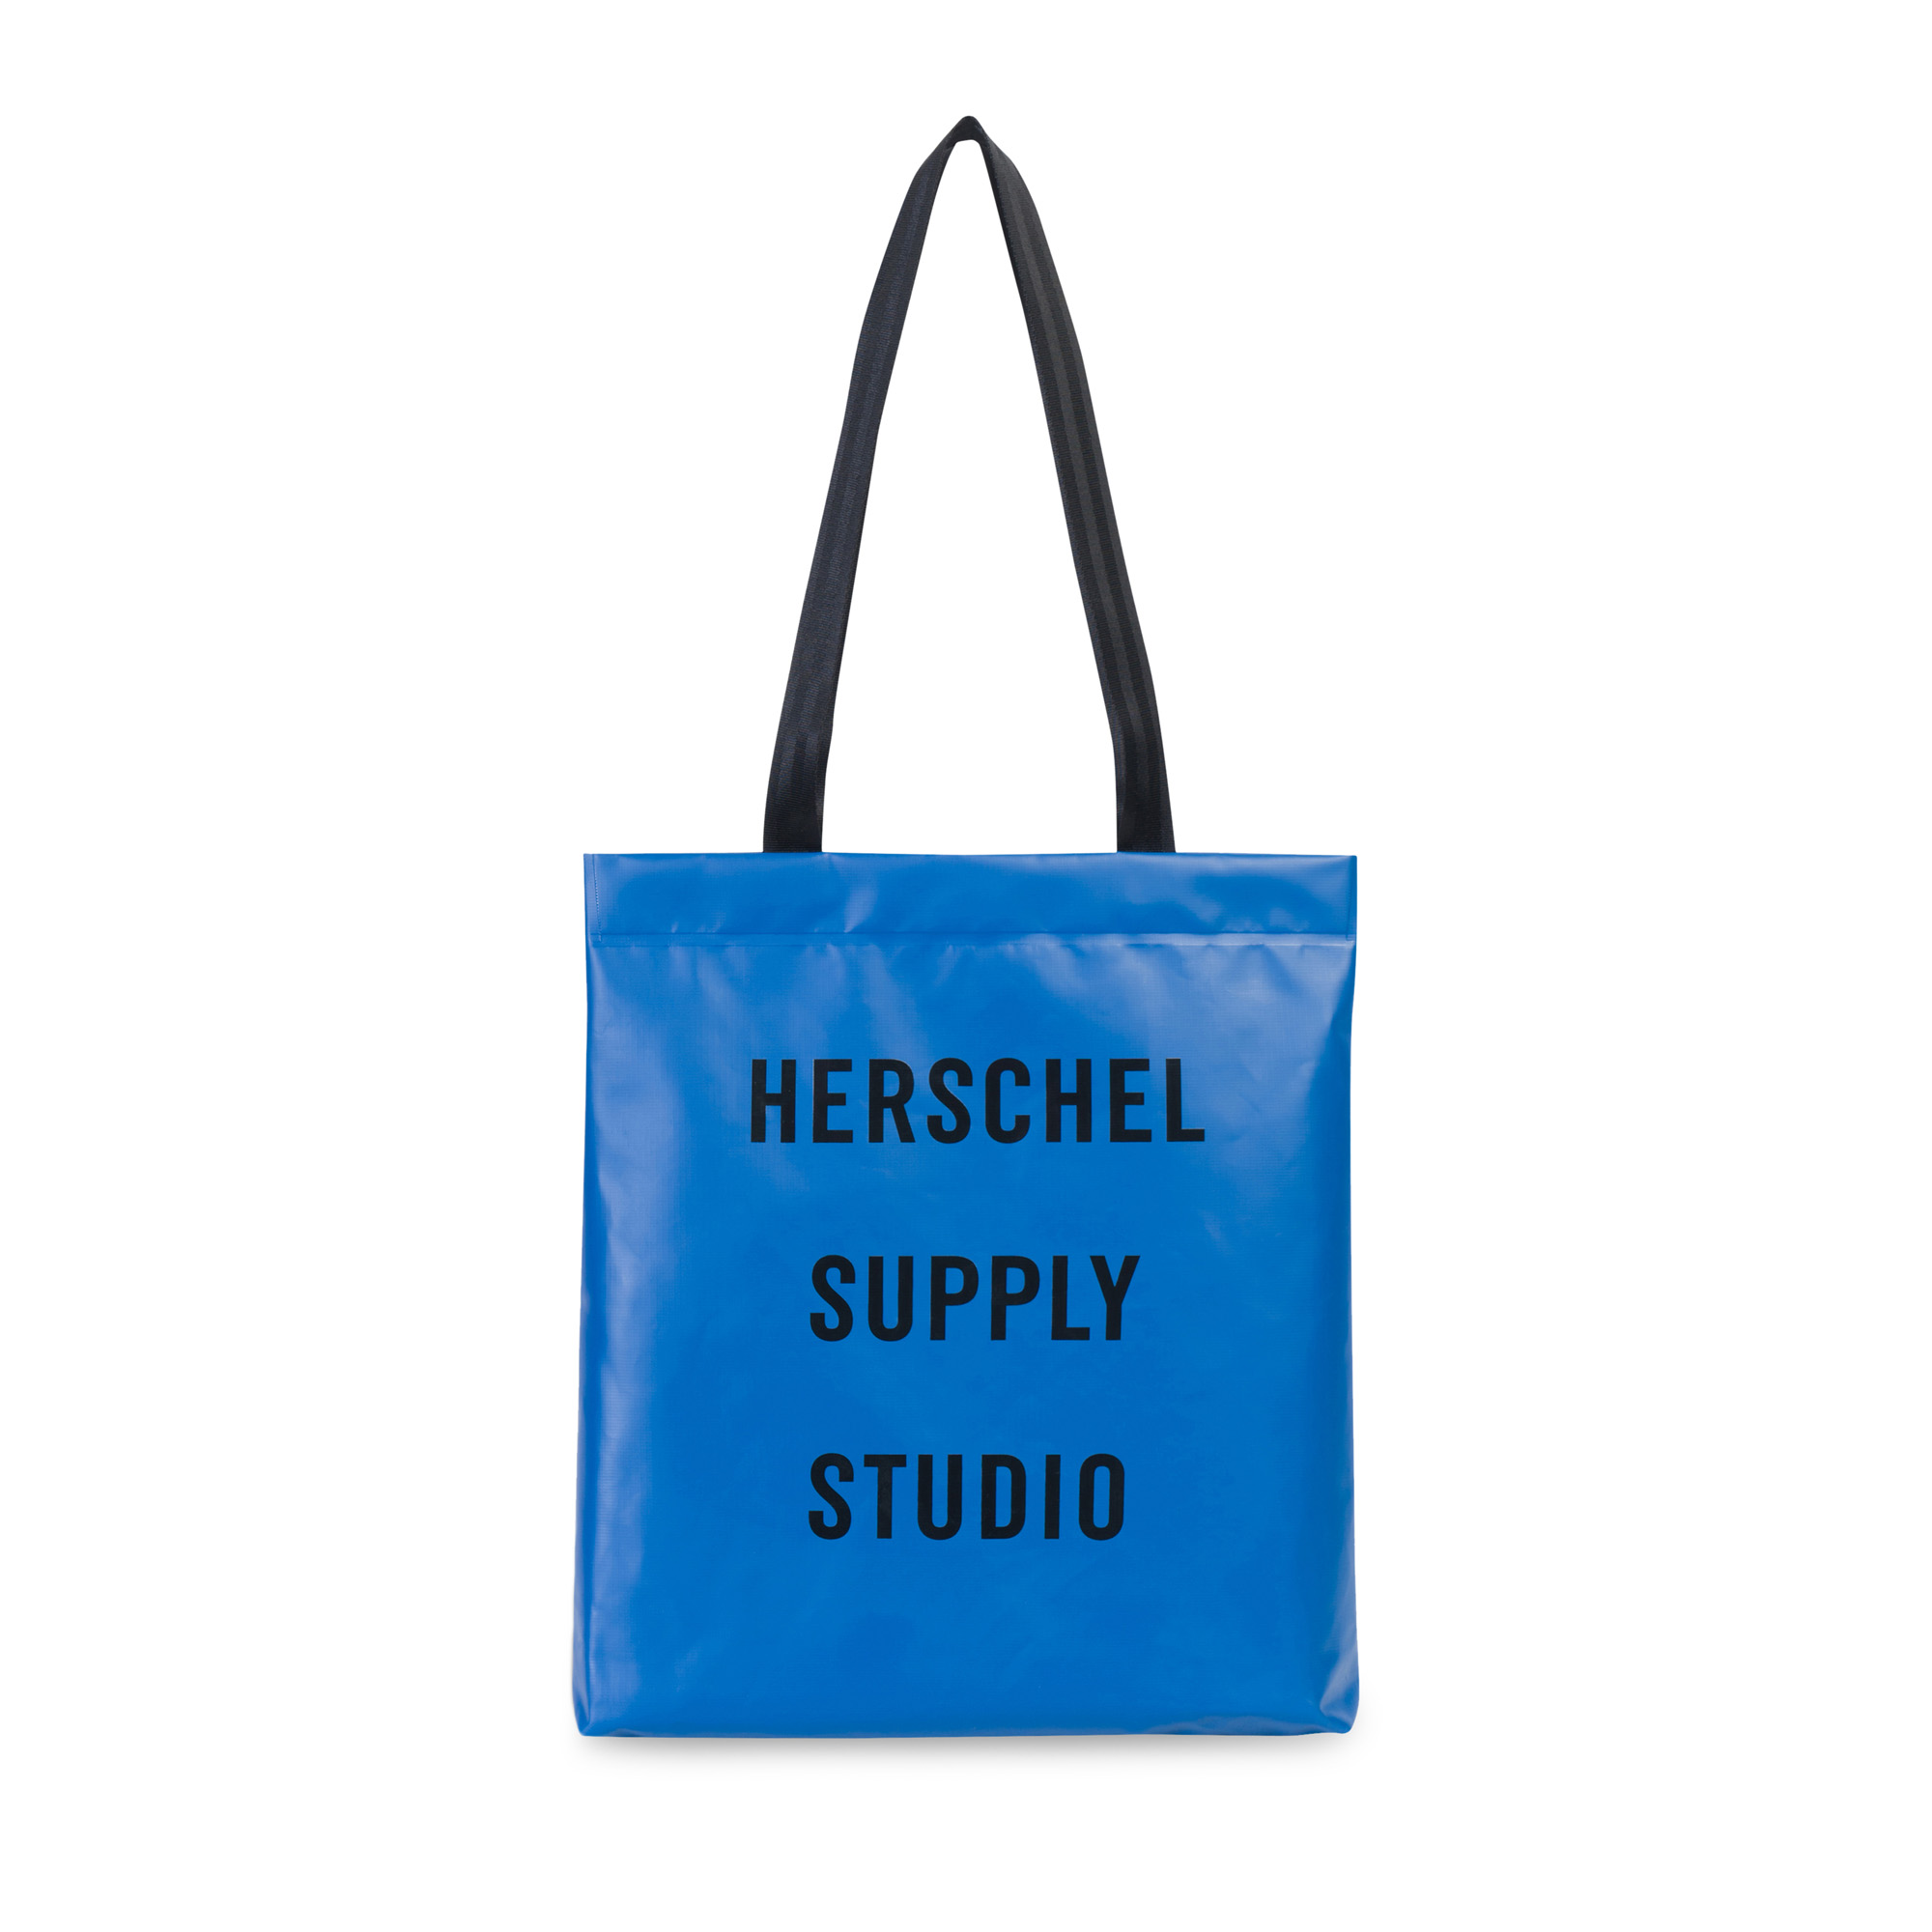 Keramas Tote Studio | Herschel Supply Company